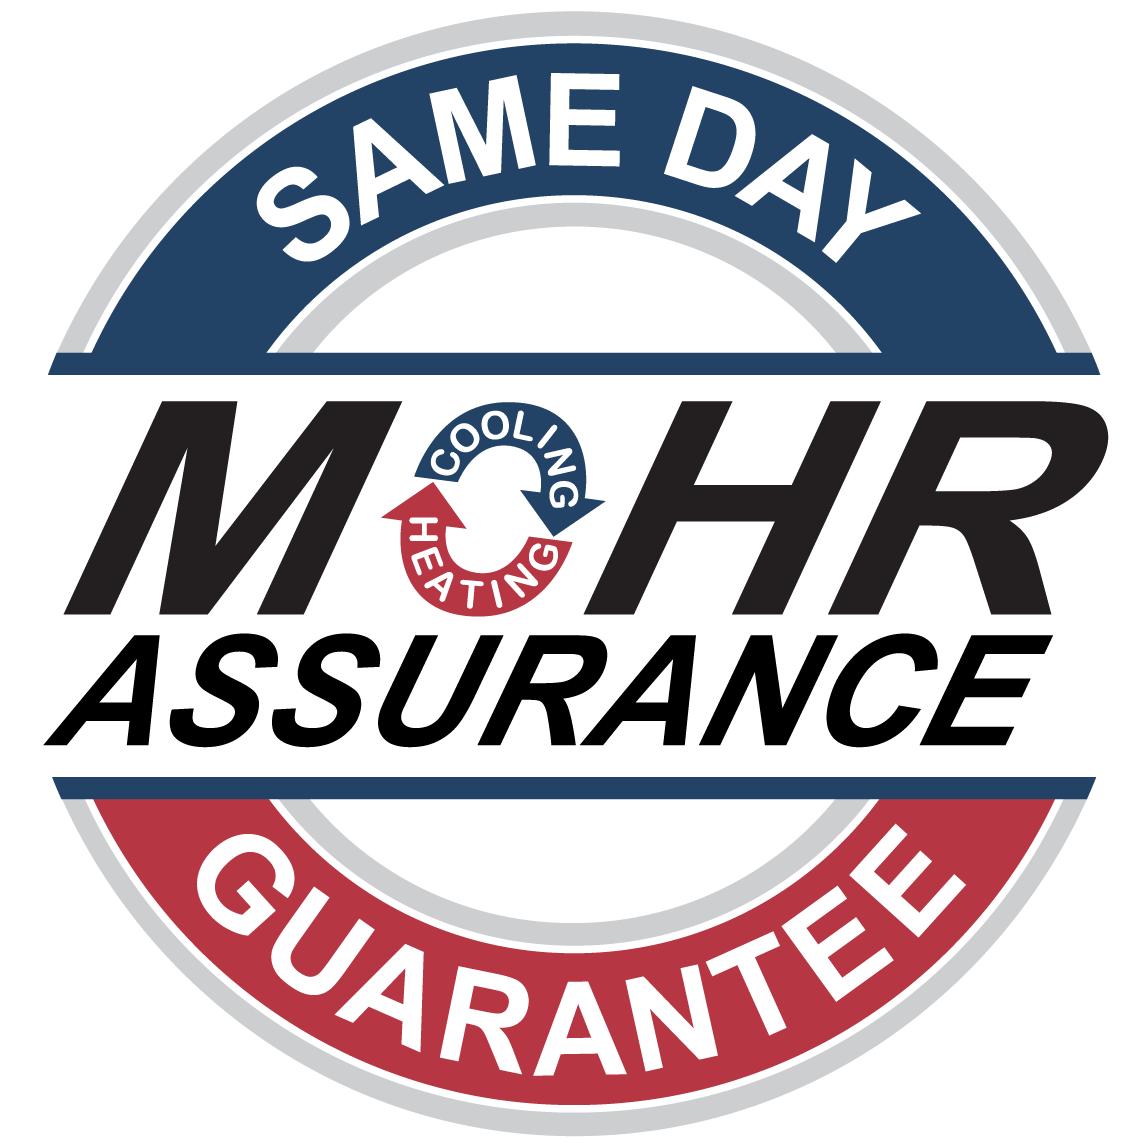 Mohr Assurance Same Day Guarantee